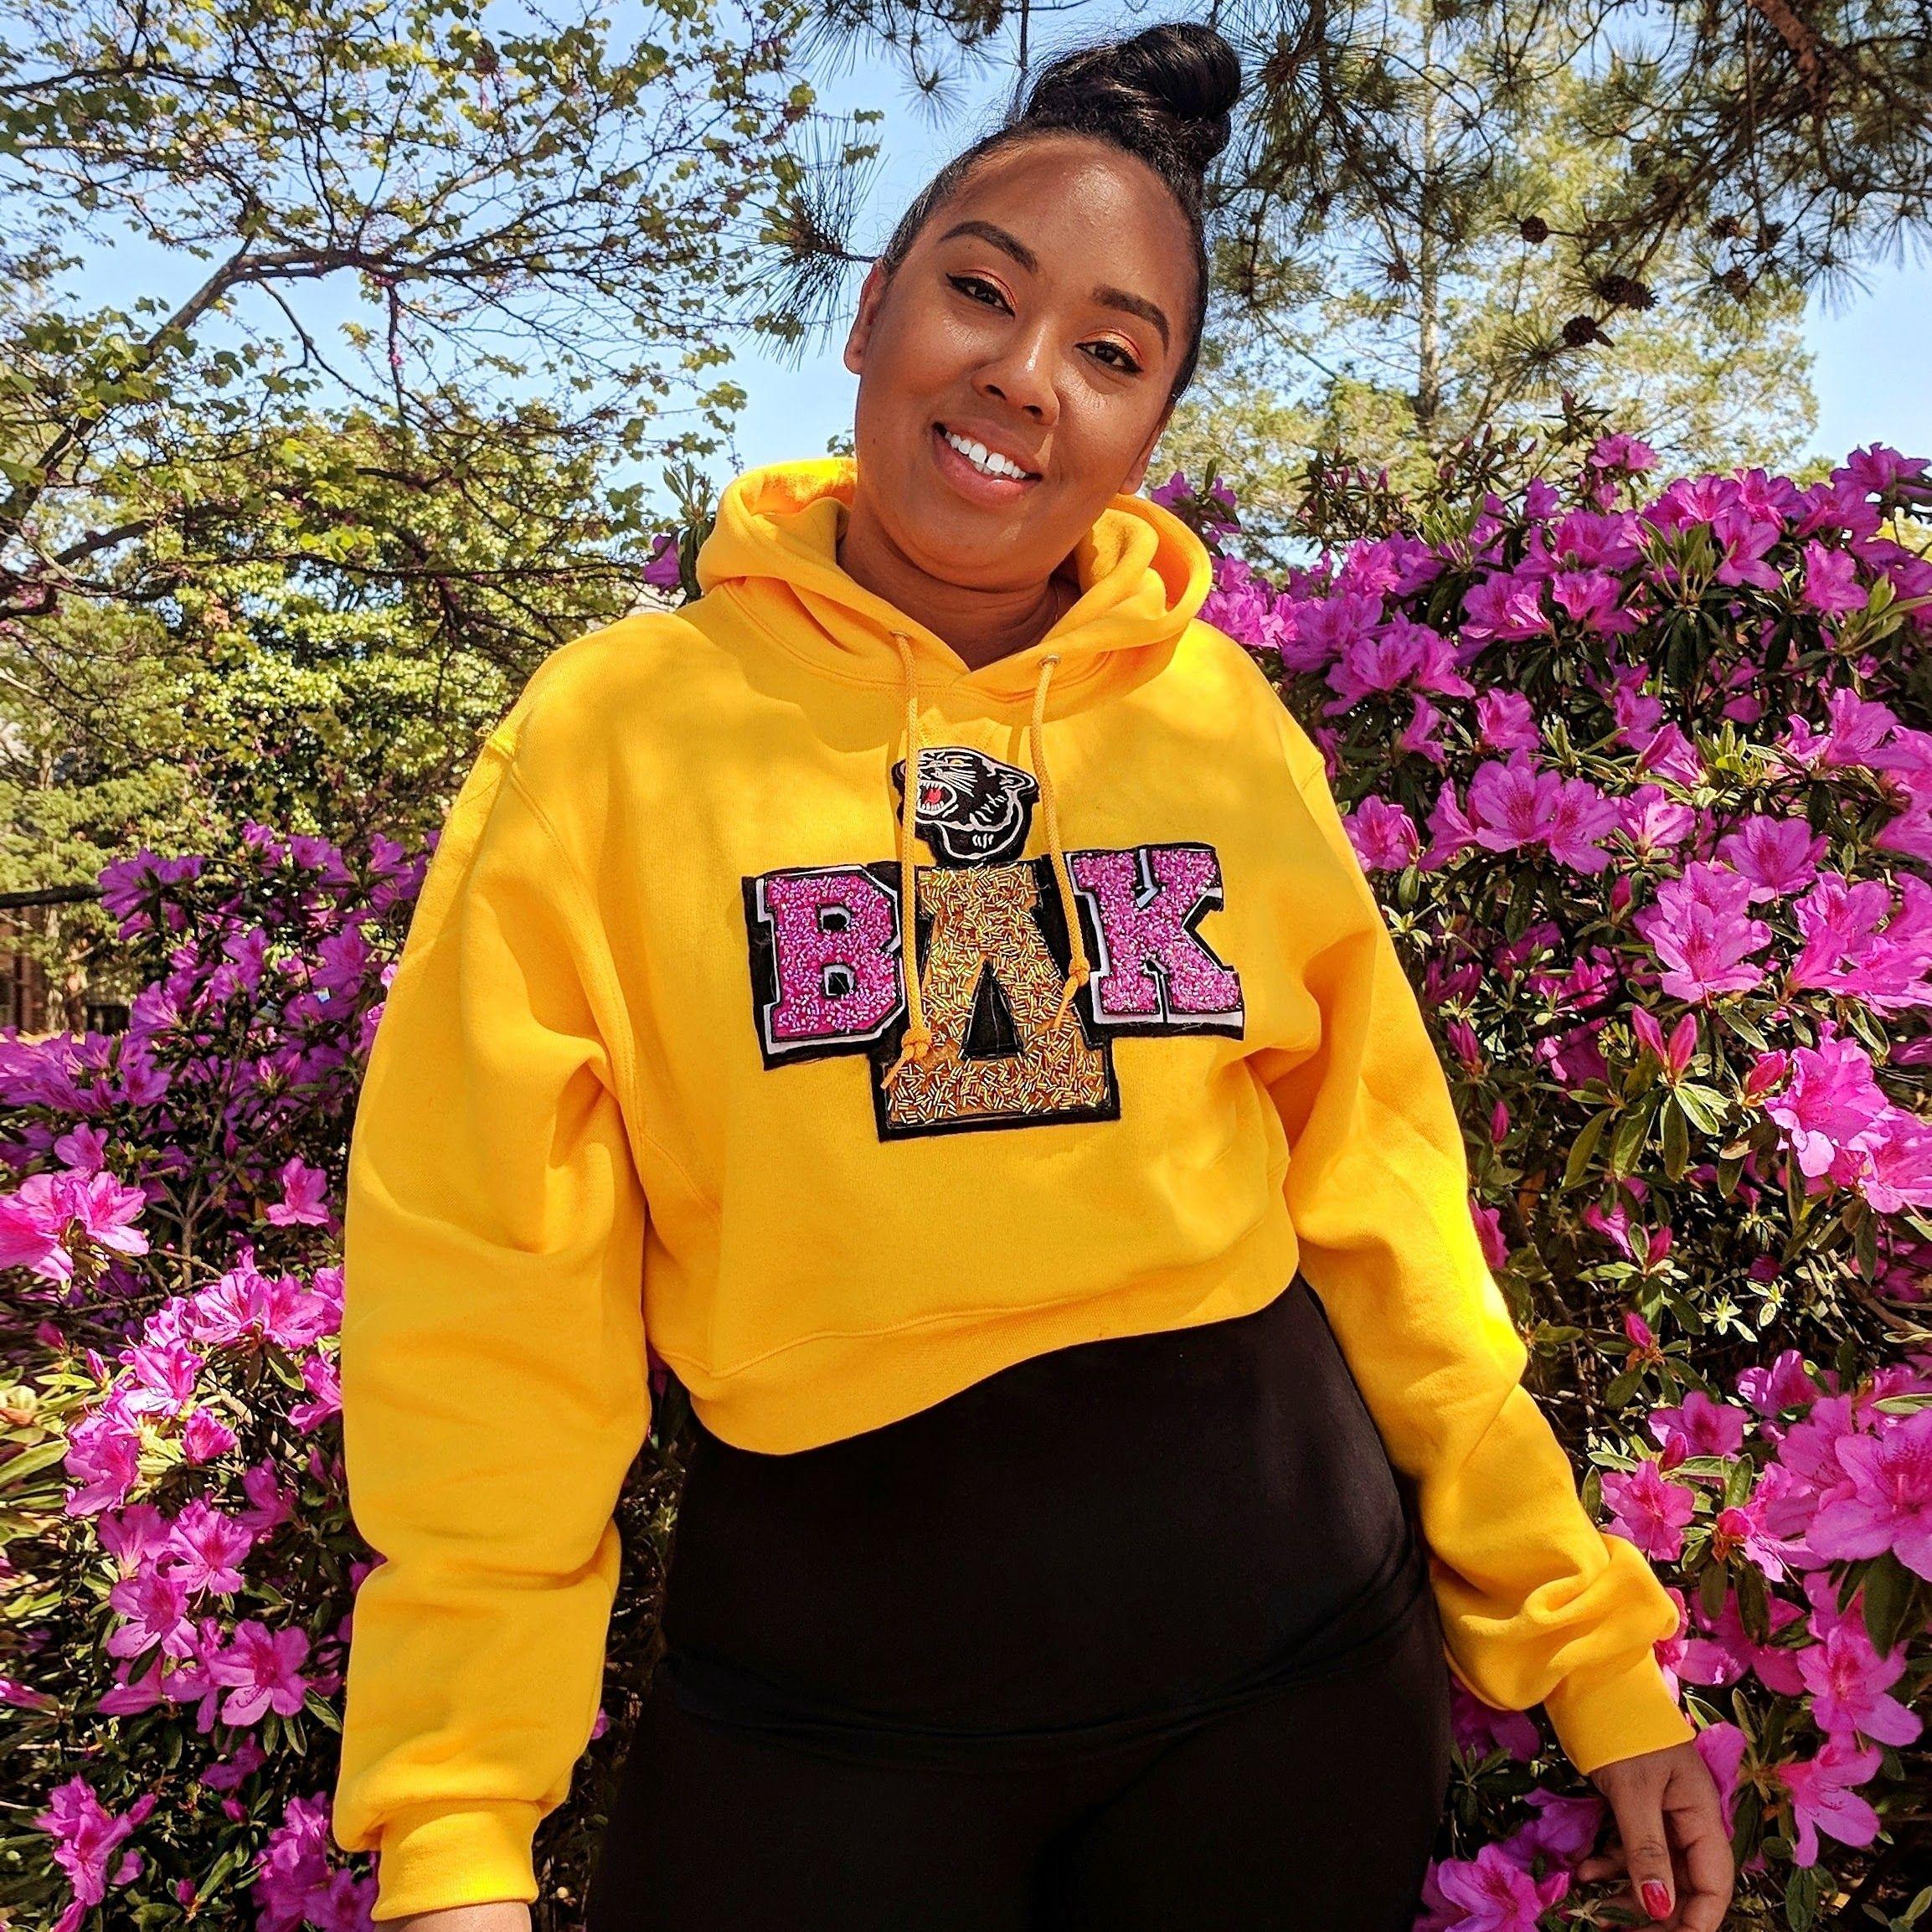 Beyonce Halloween 2020 Designer Look for Less: Balmain Beychella Hoodie — Tabitha Sewer